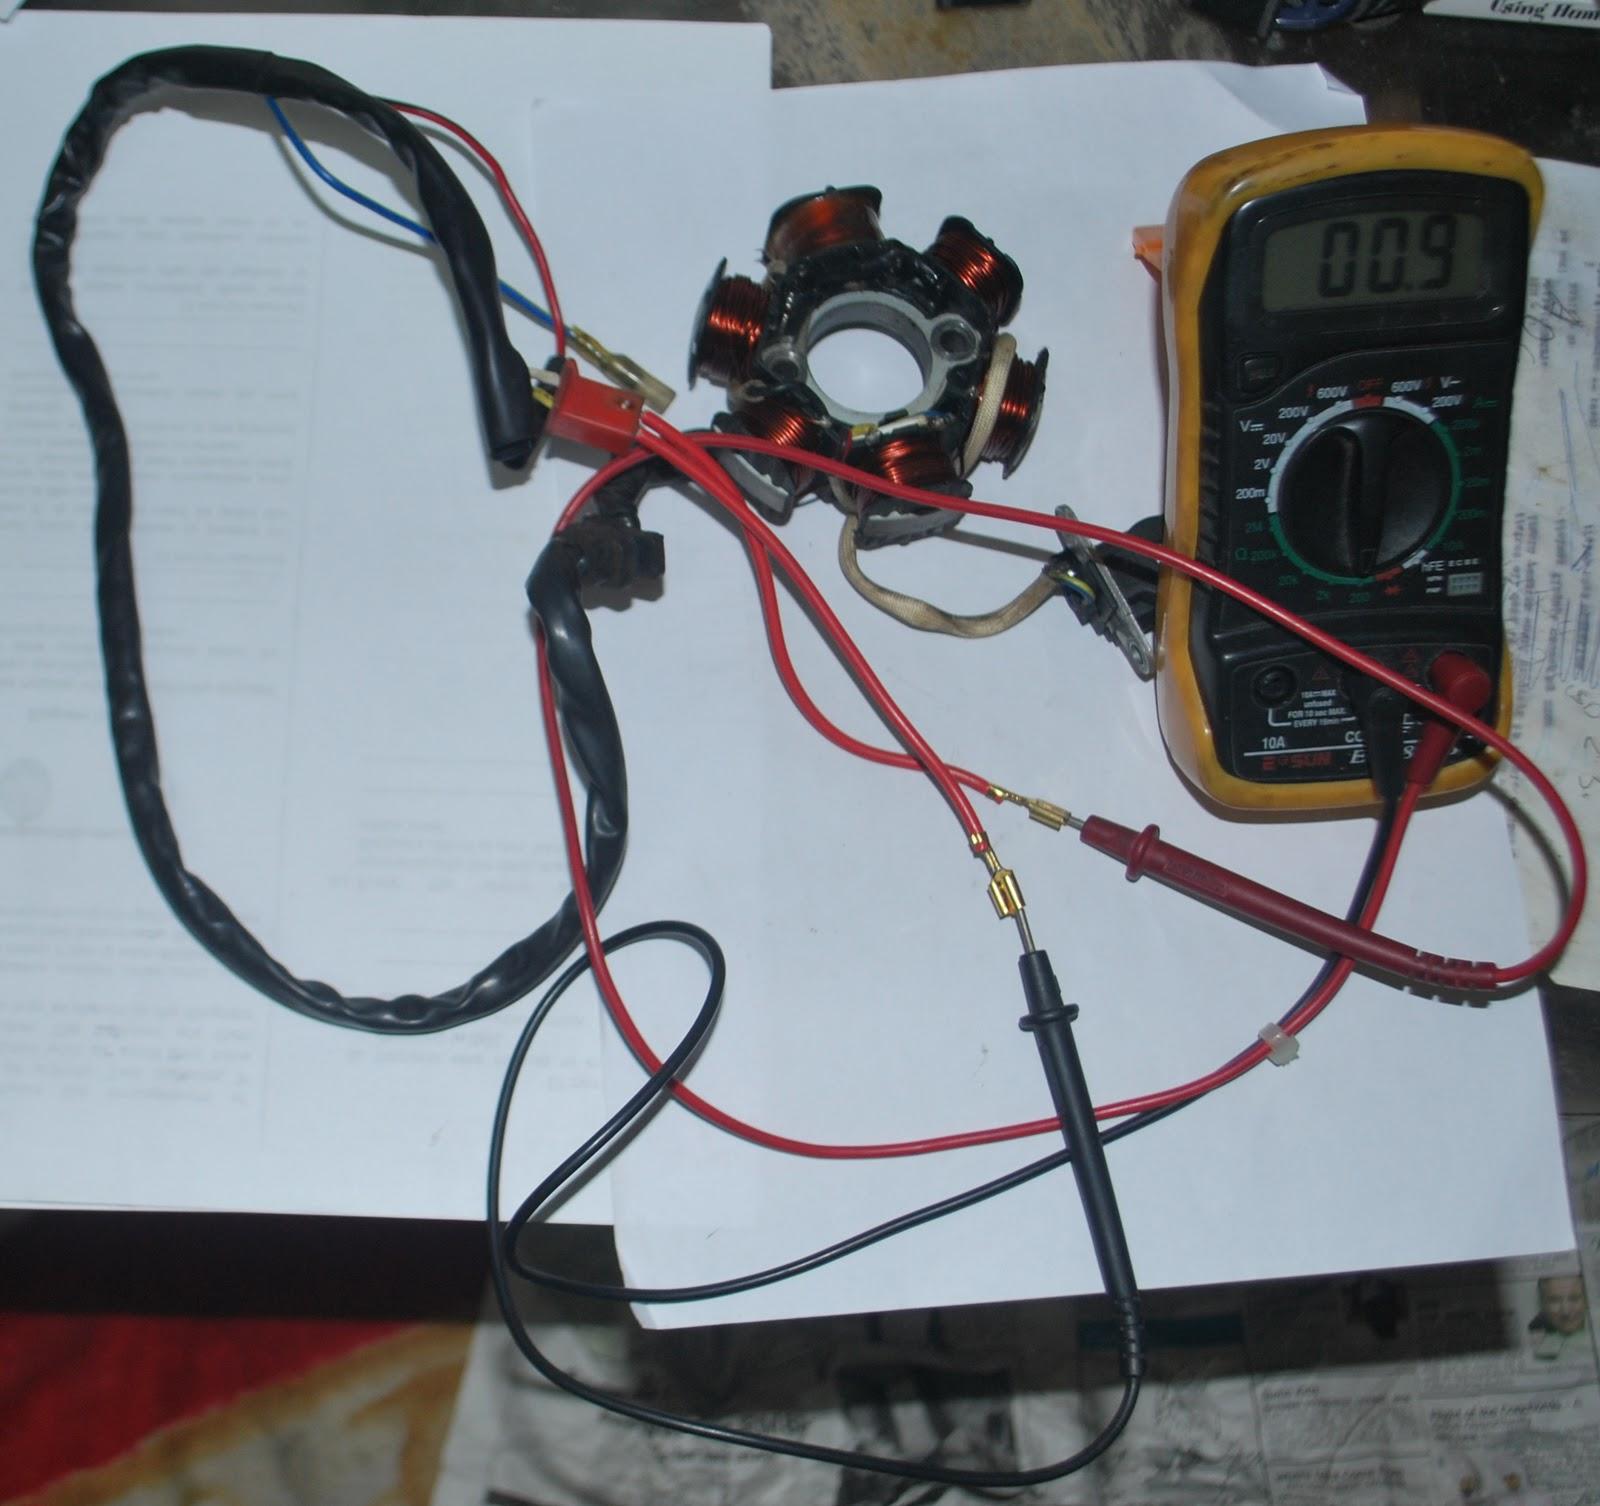 150 Wiring Diagram Additionally Crossfire Gy6 150 Wiring Diagram On